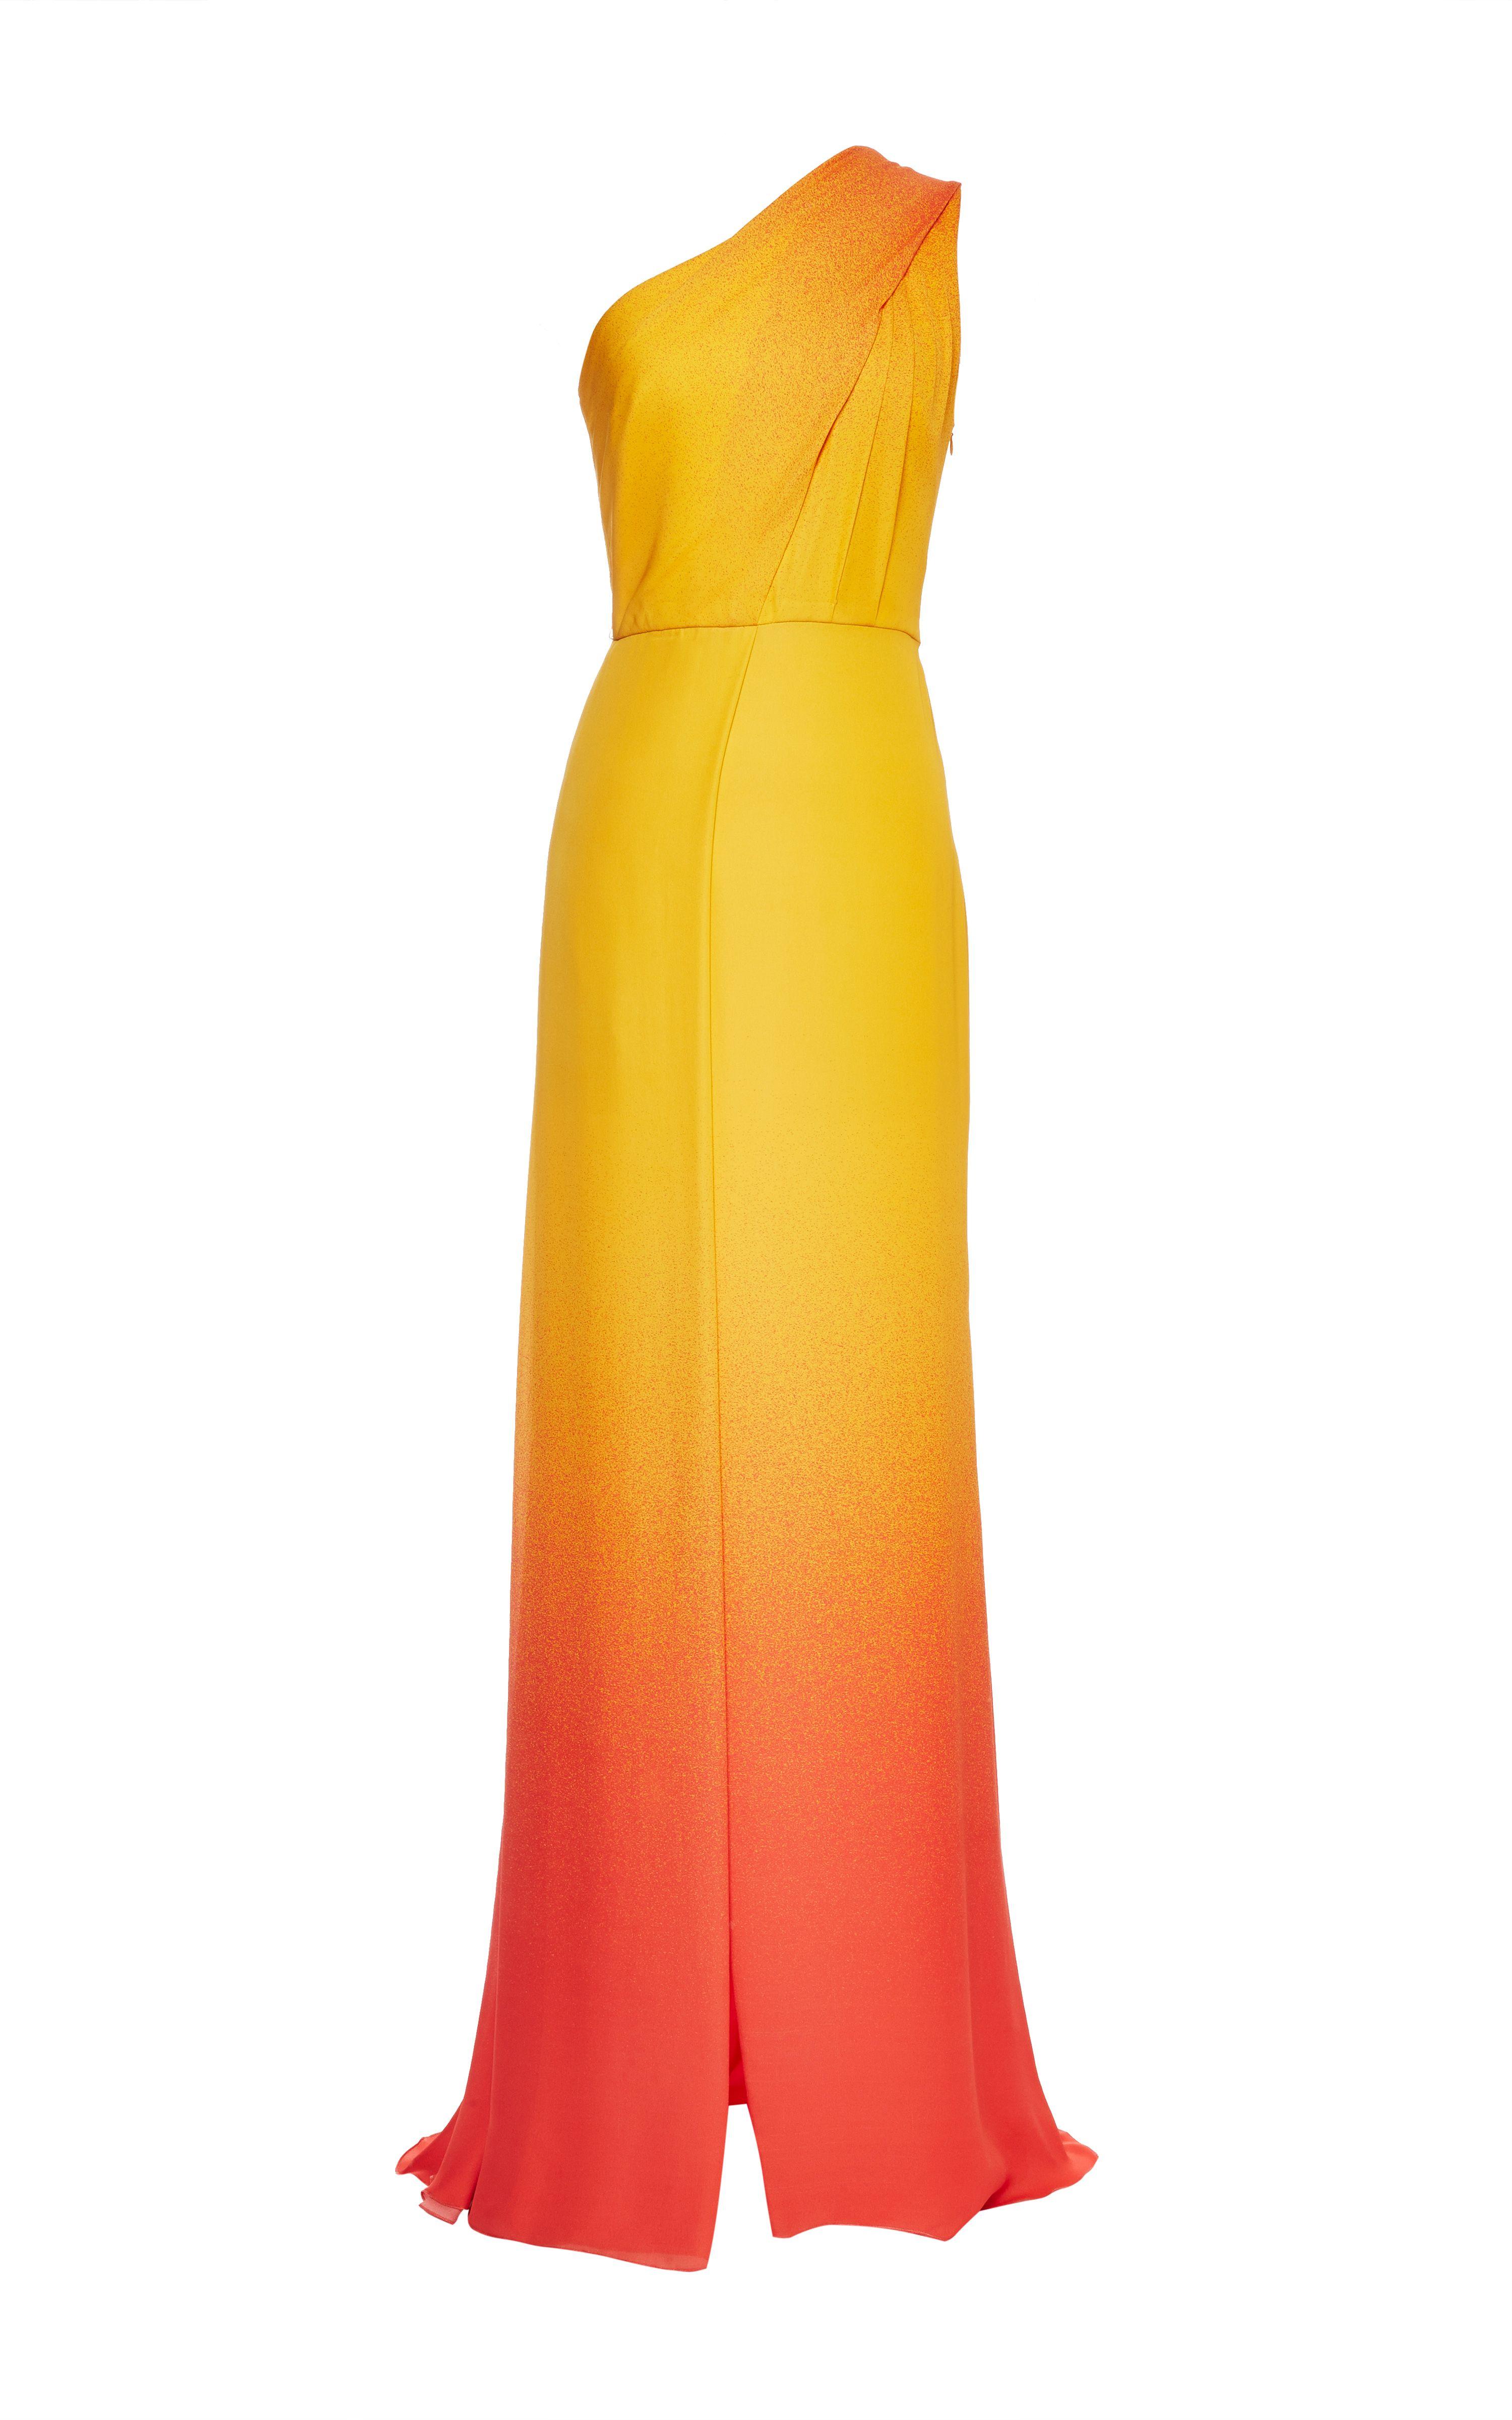 Elie saab orange degrade double silk georgette dress fashion lust